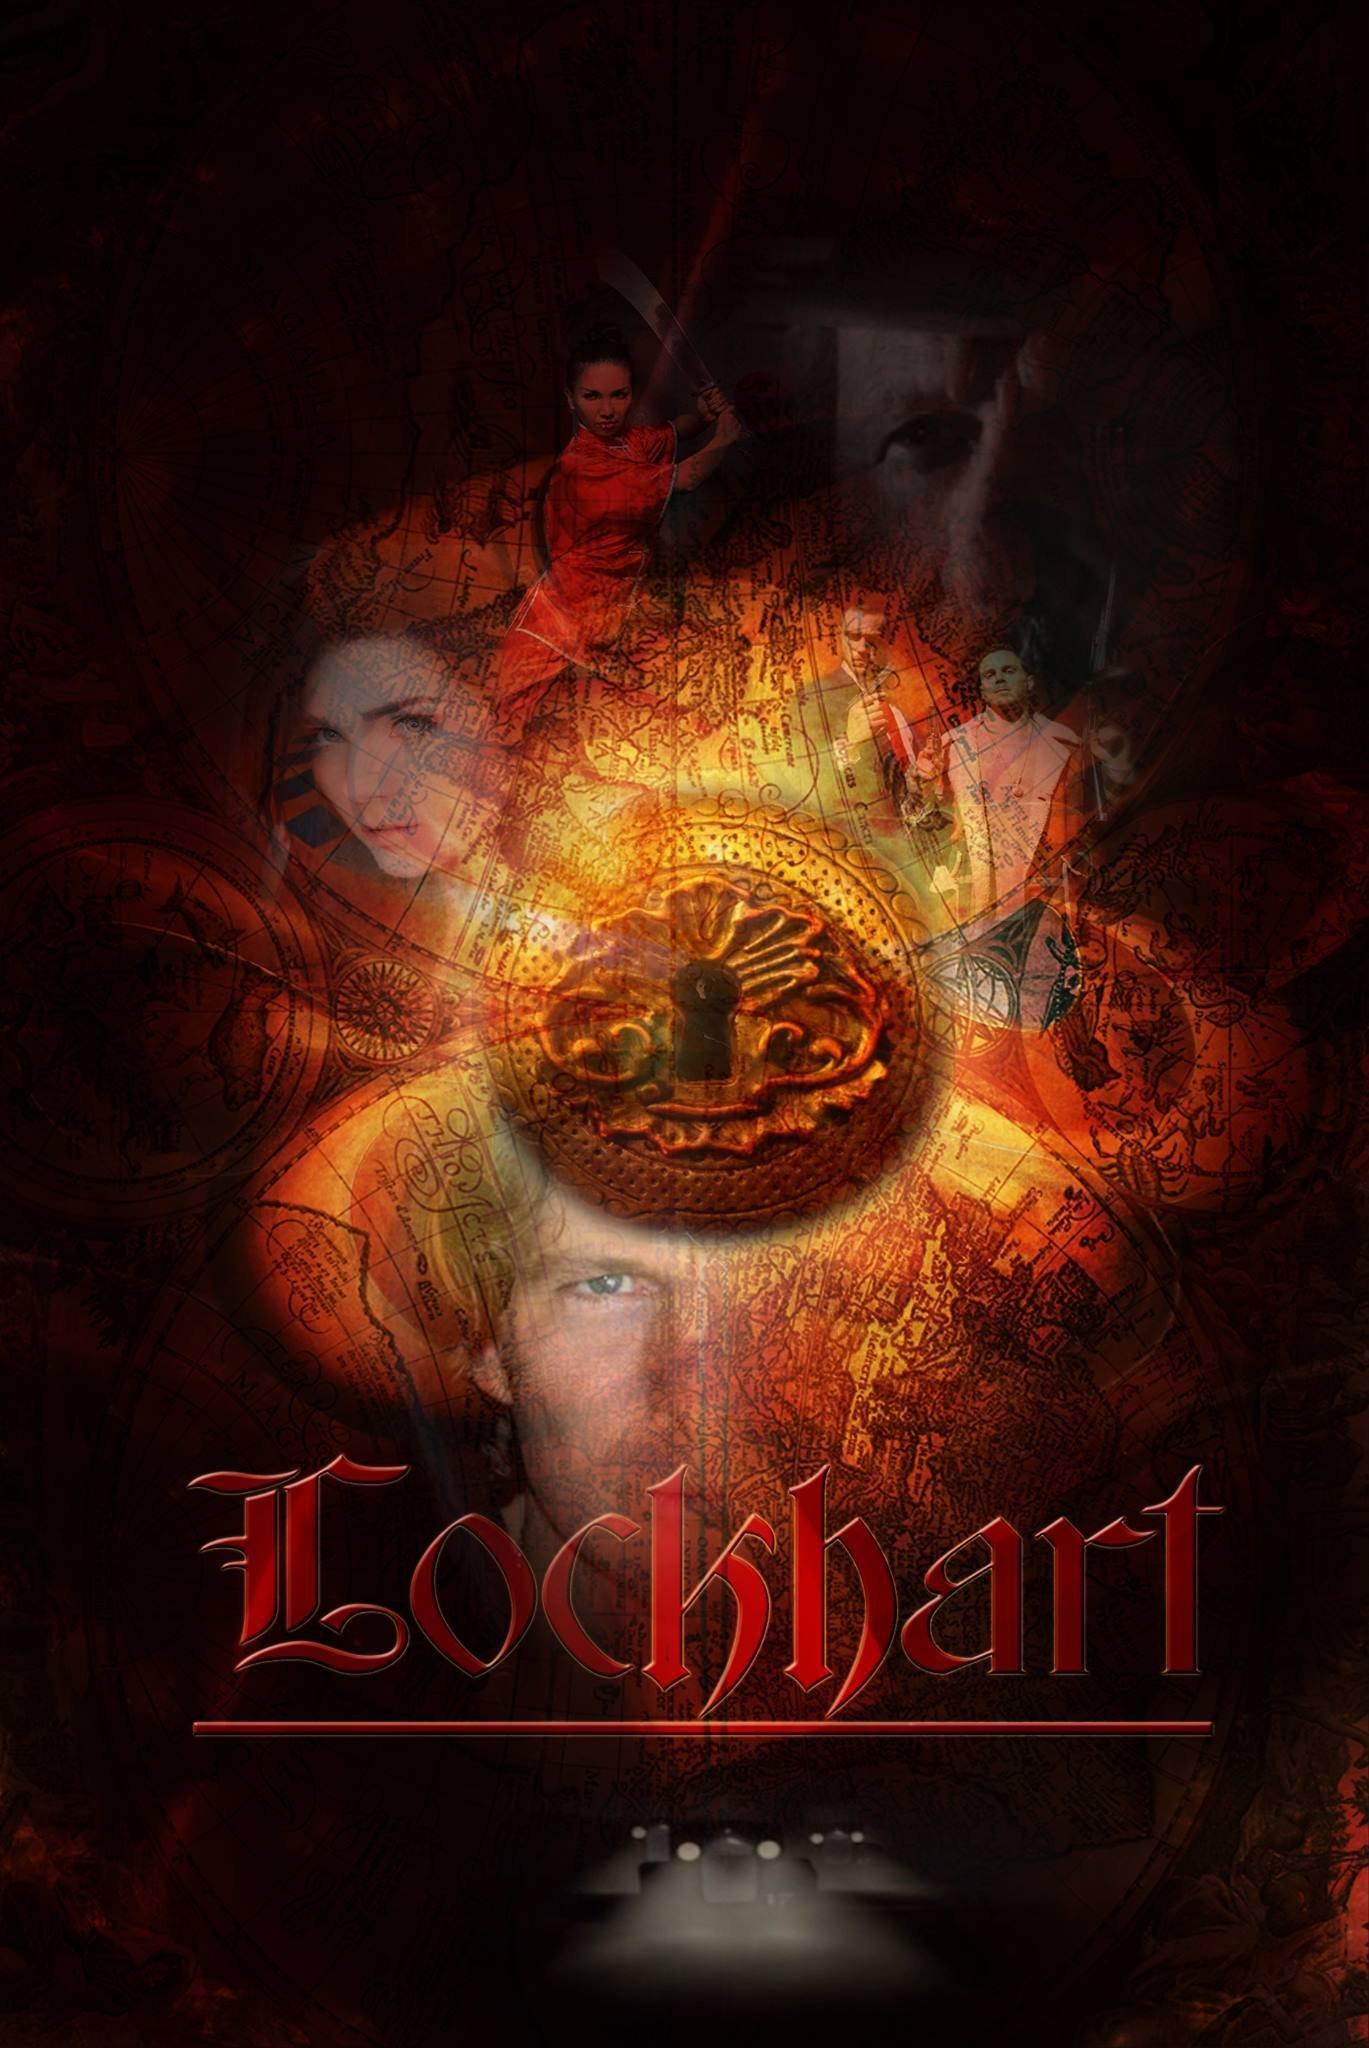 lockhart unleashing the talisman imdbpro